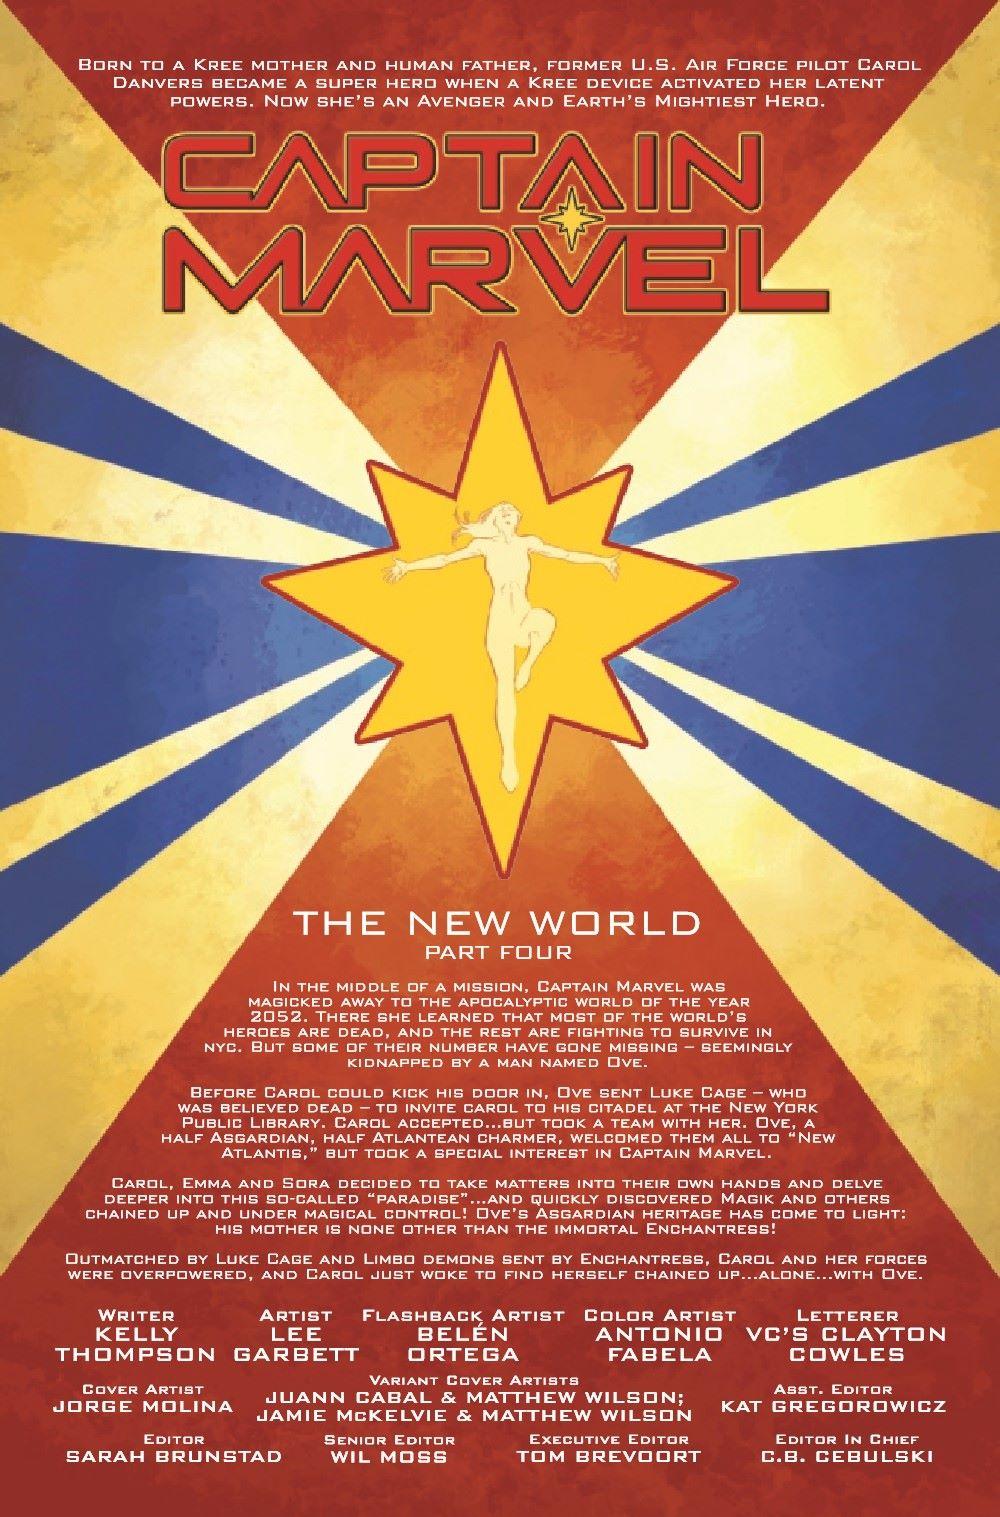 CAPMARV2019025_Preview-2 ComicList Previews: CAPTAIN MARVEL #25